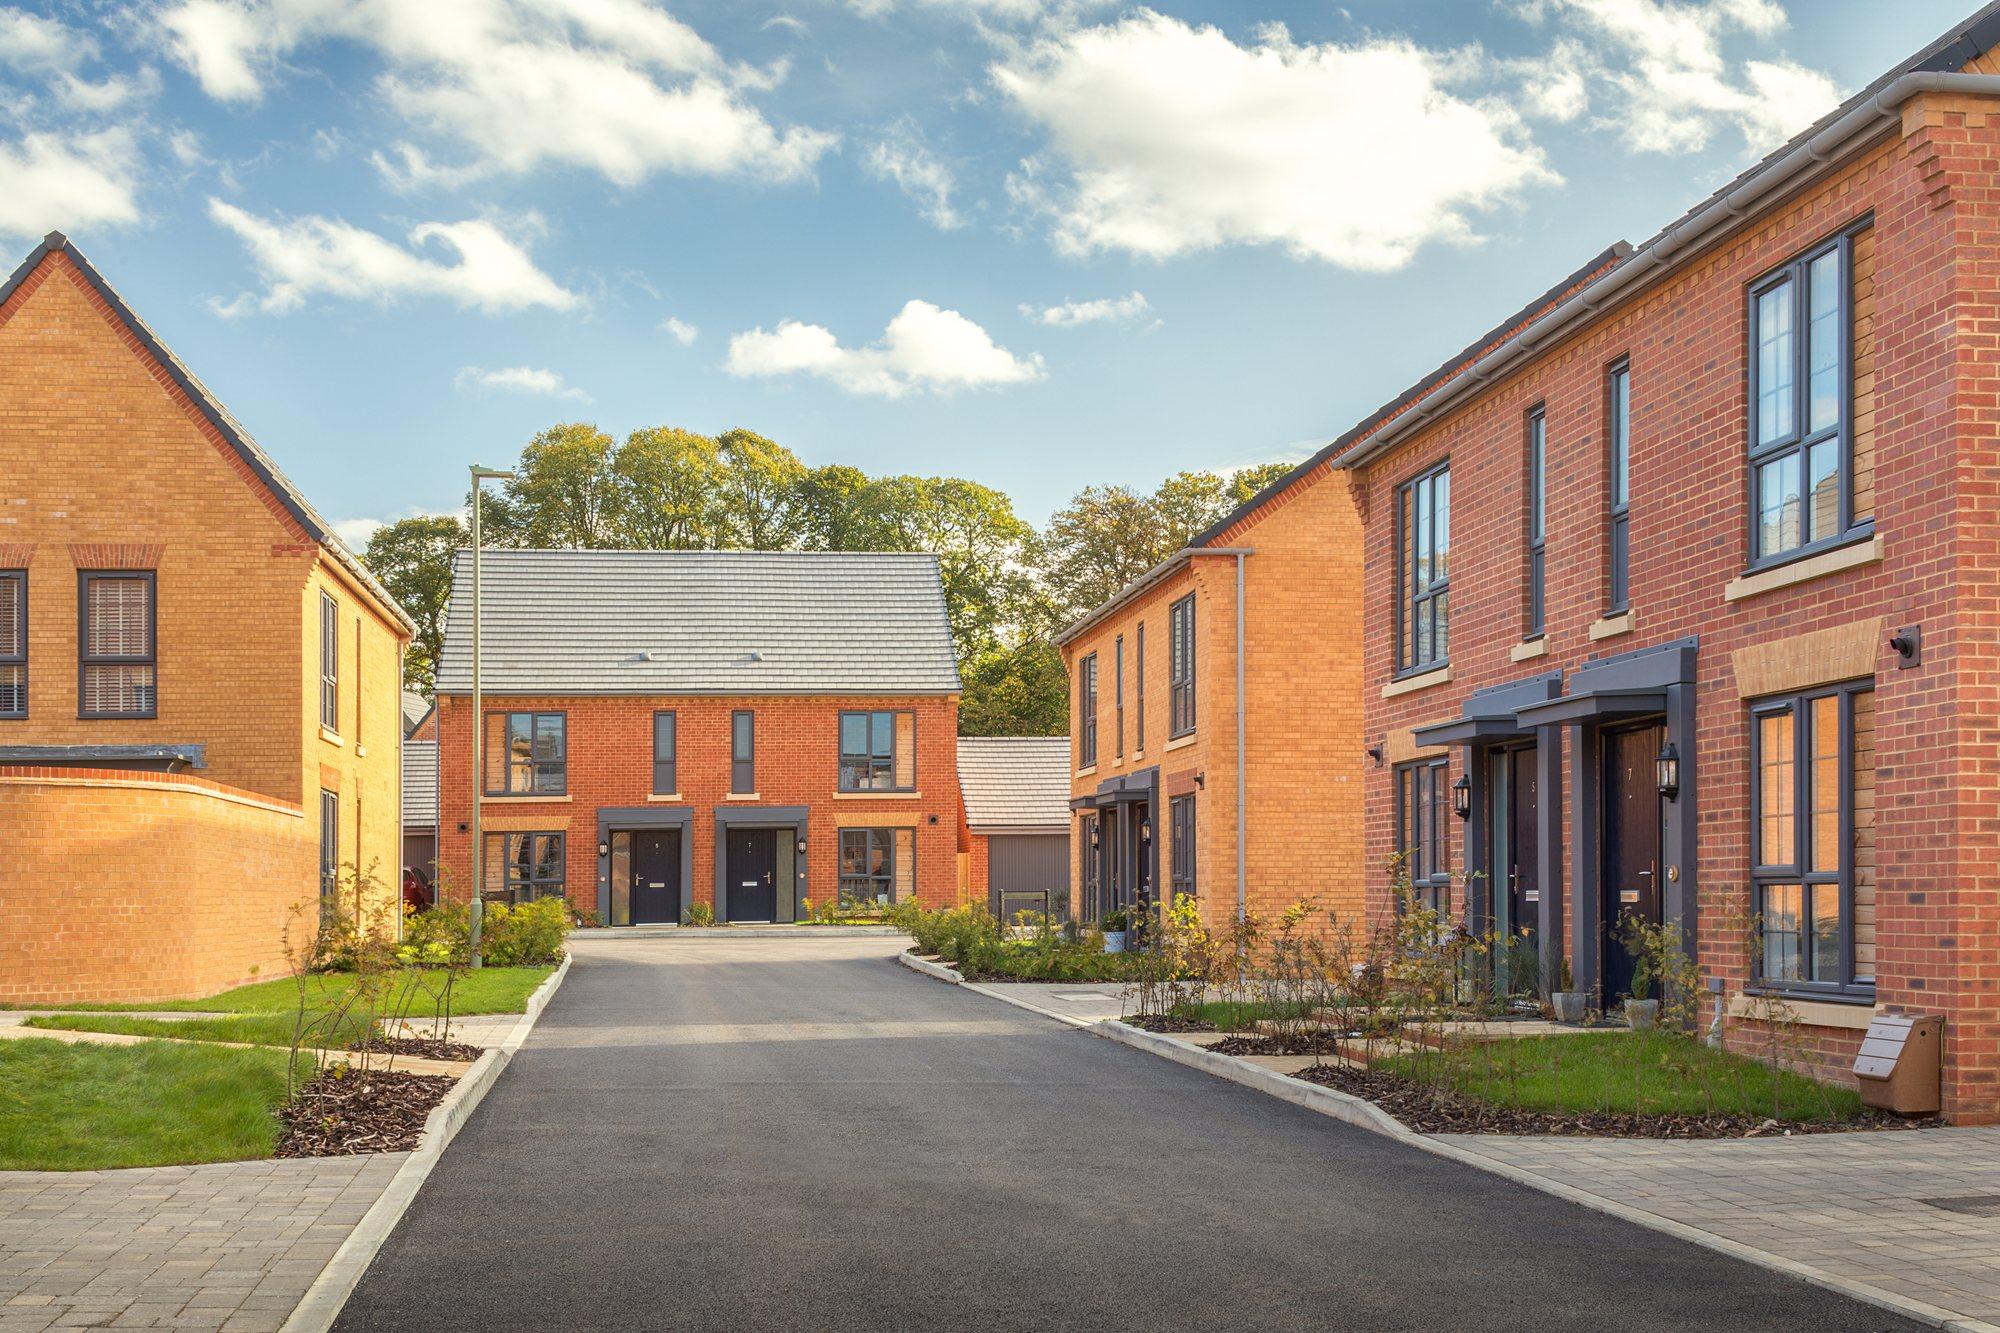 New Build Homes in Bordon